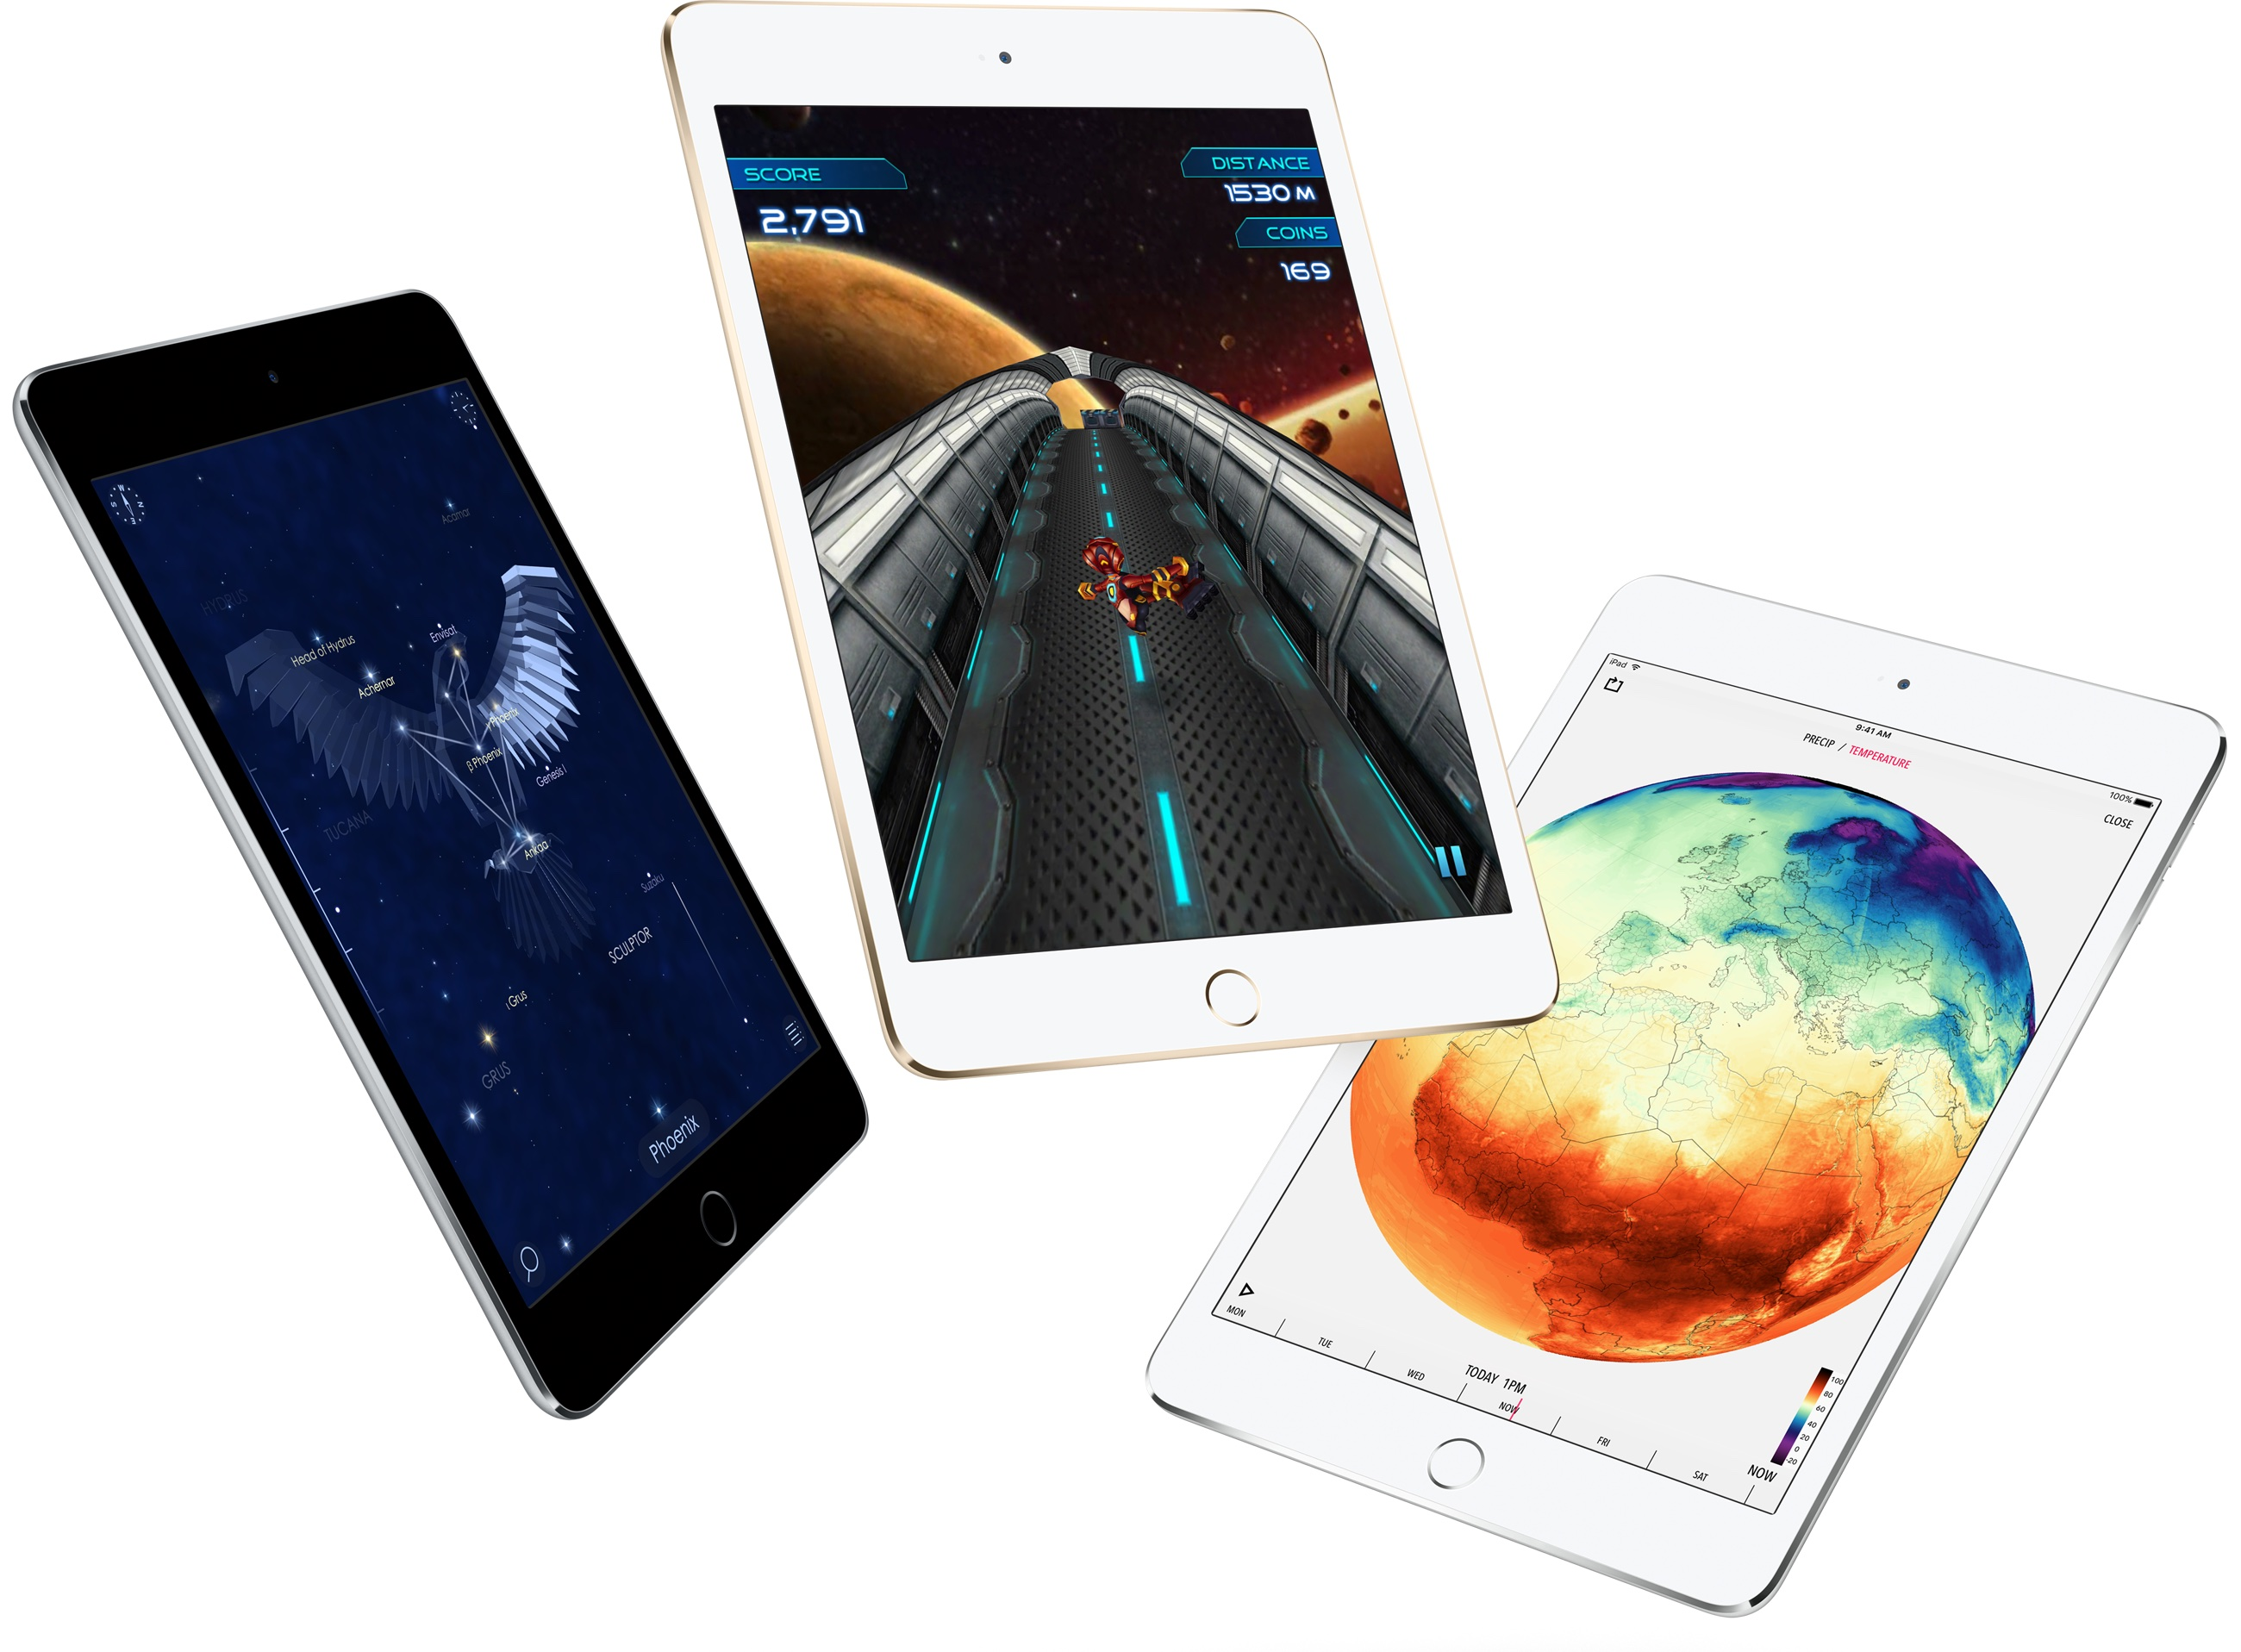 Afla totul despre iPad mini 4